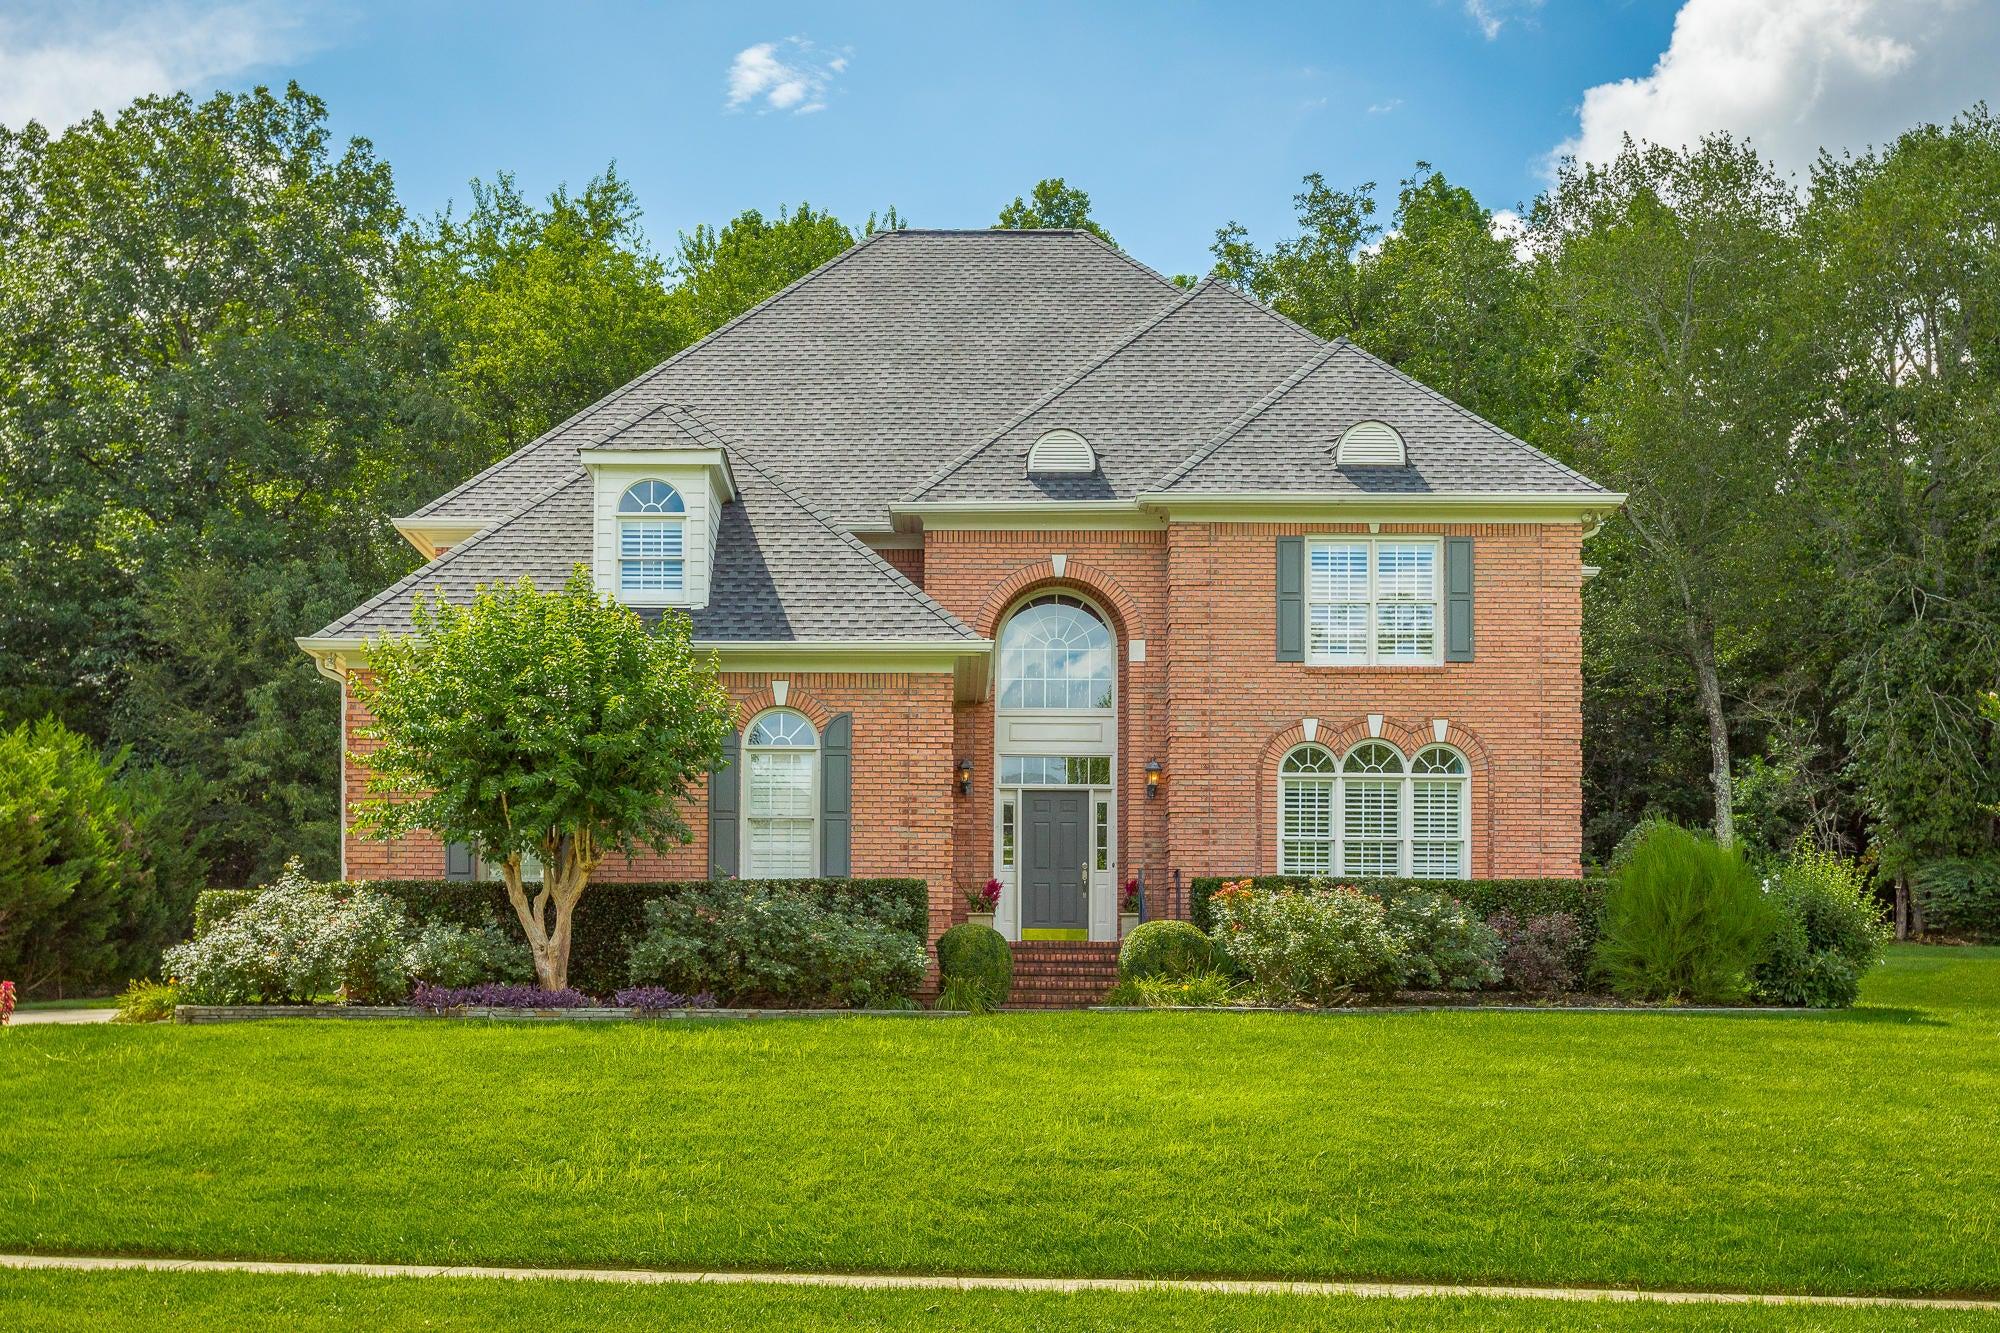 9619 Windrose Cir, Chattanooga, TN 37421